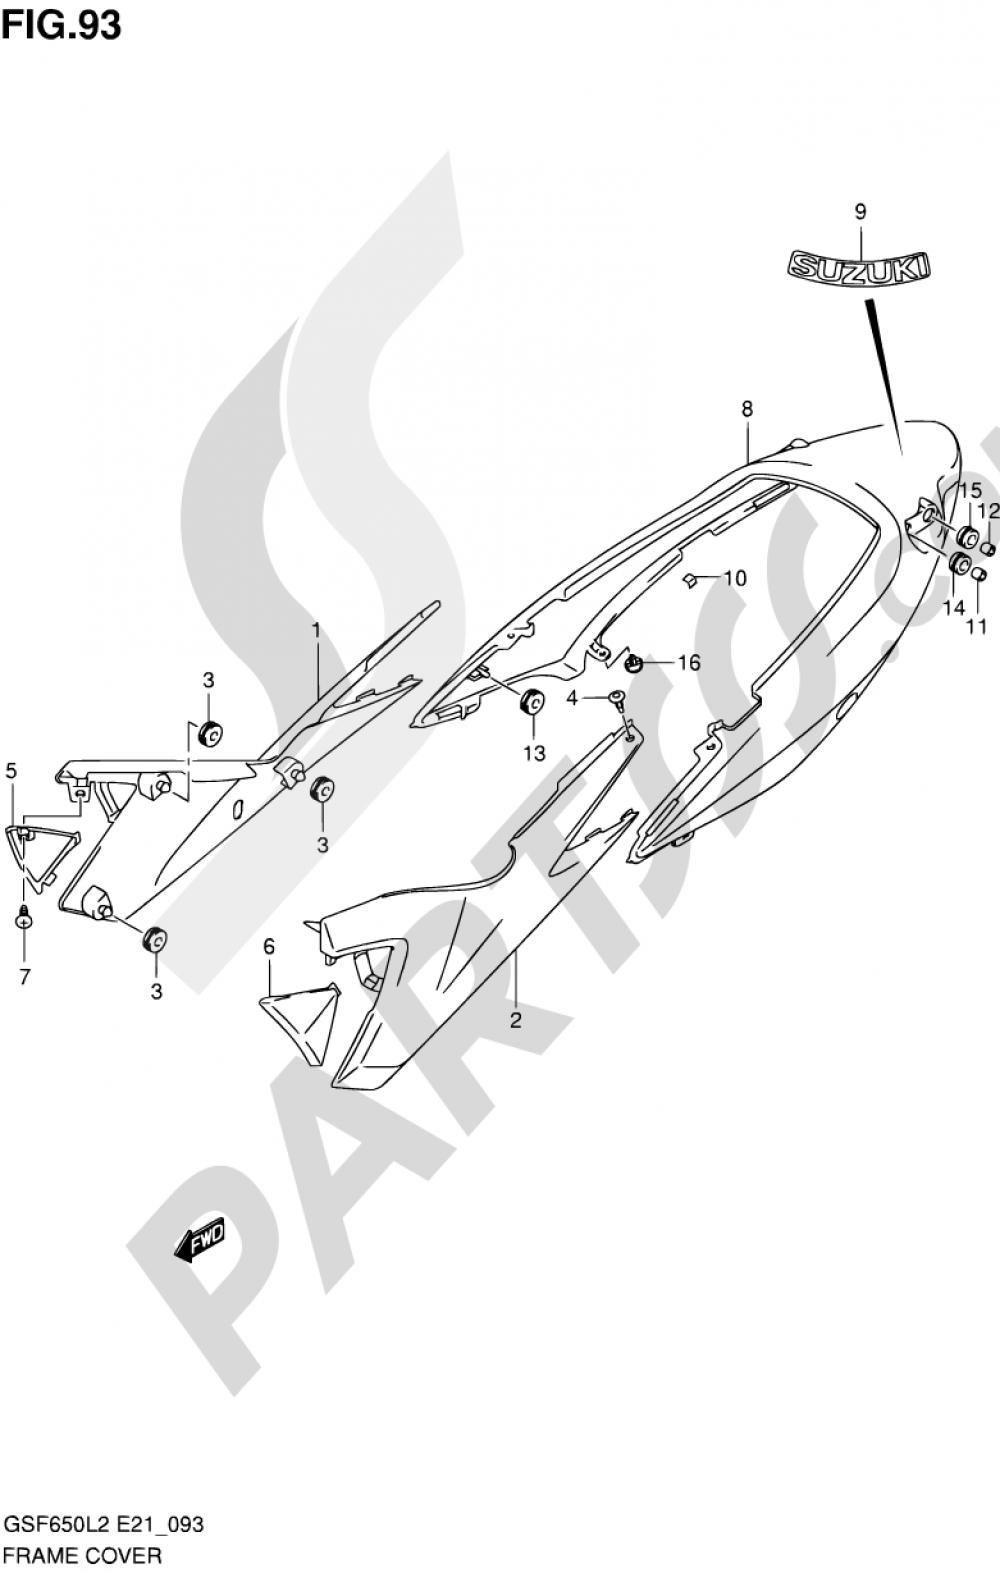 93 - FRAME COVER (GSF650SAL2 E21) Suzuki BANDIT GSF650 2012